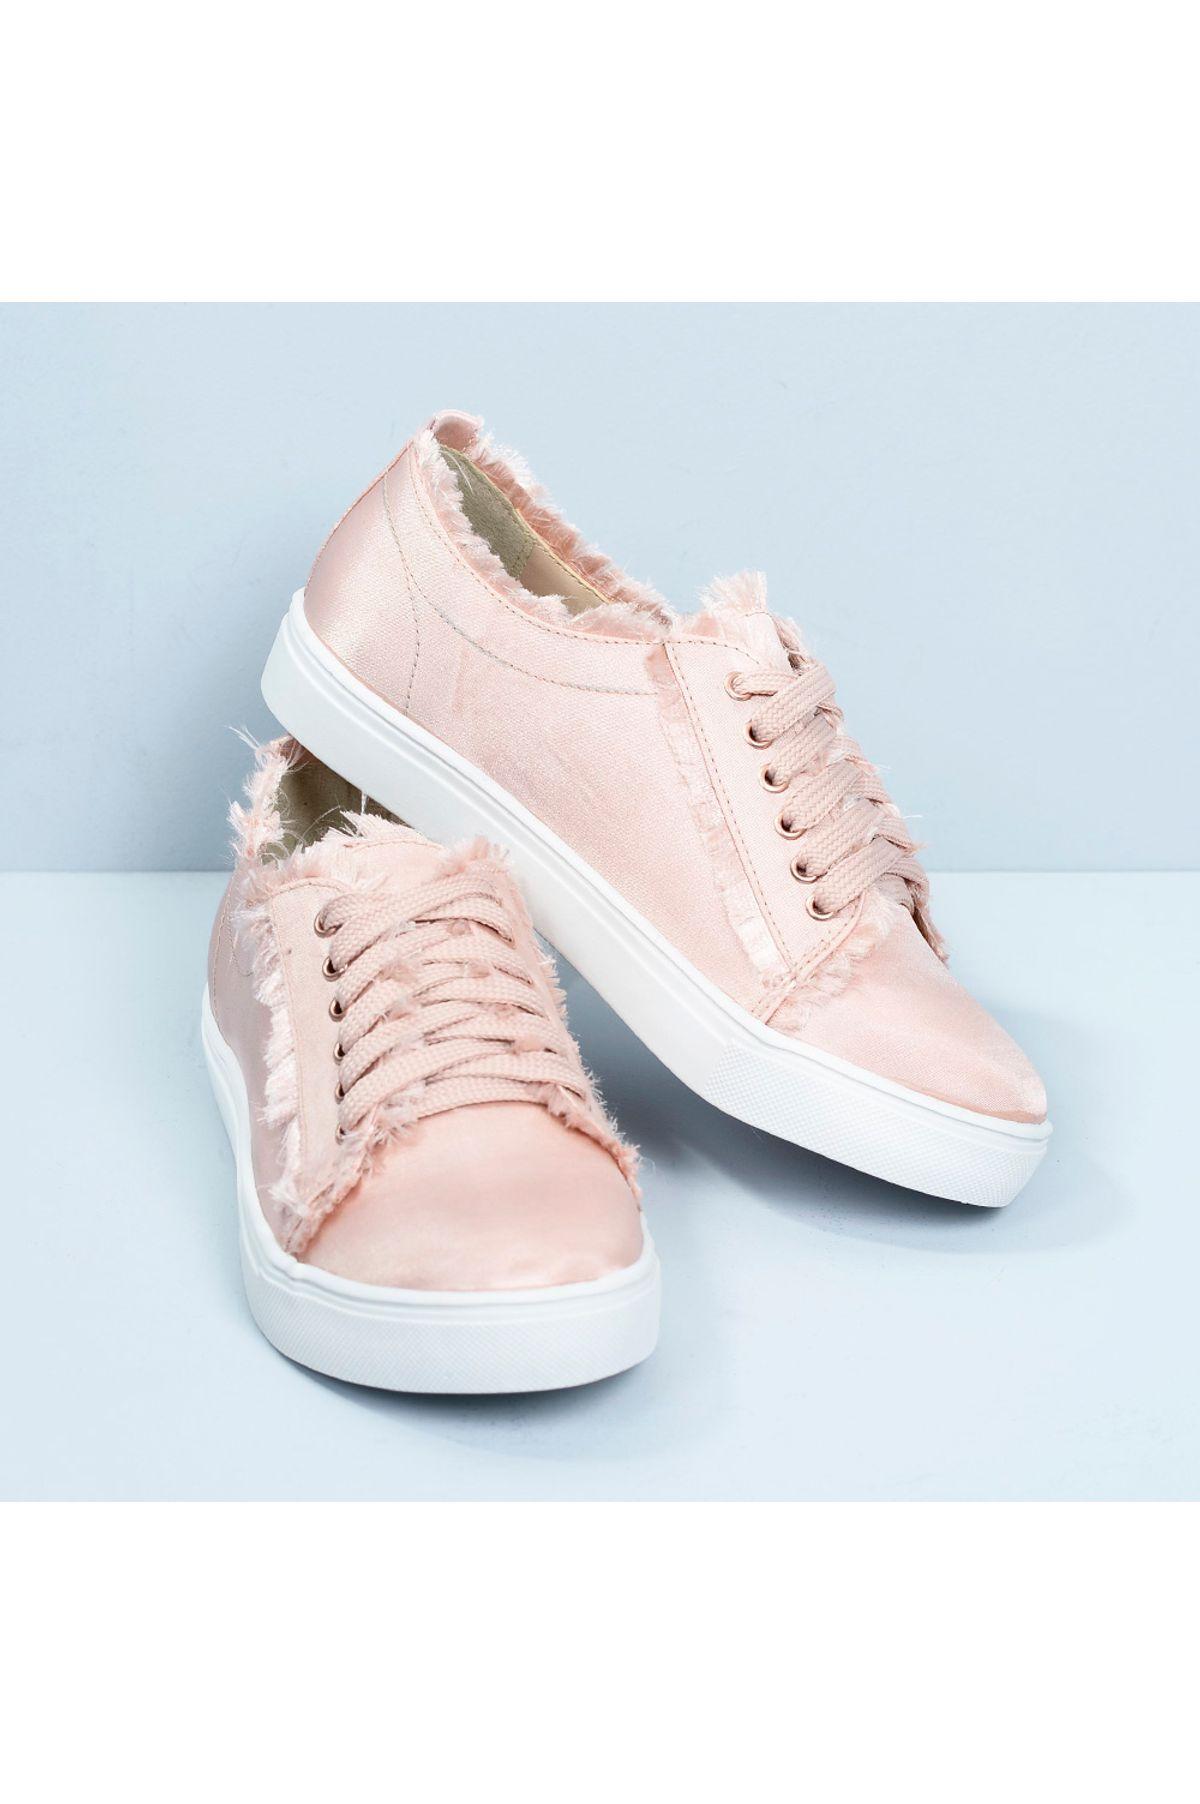 ac6e6f5f0d099 Tênis Feminino Eliana Mundial   Mundial Calçados - Mundial Calçados